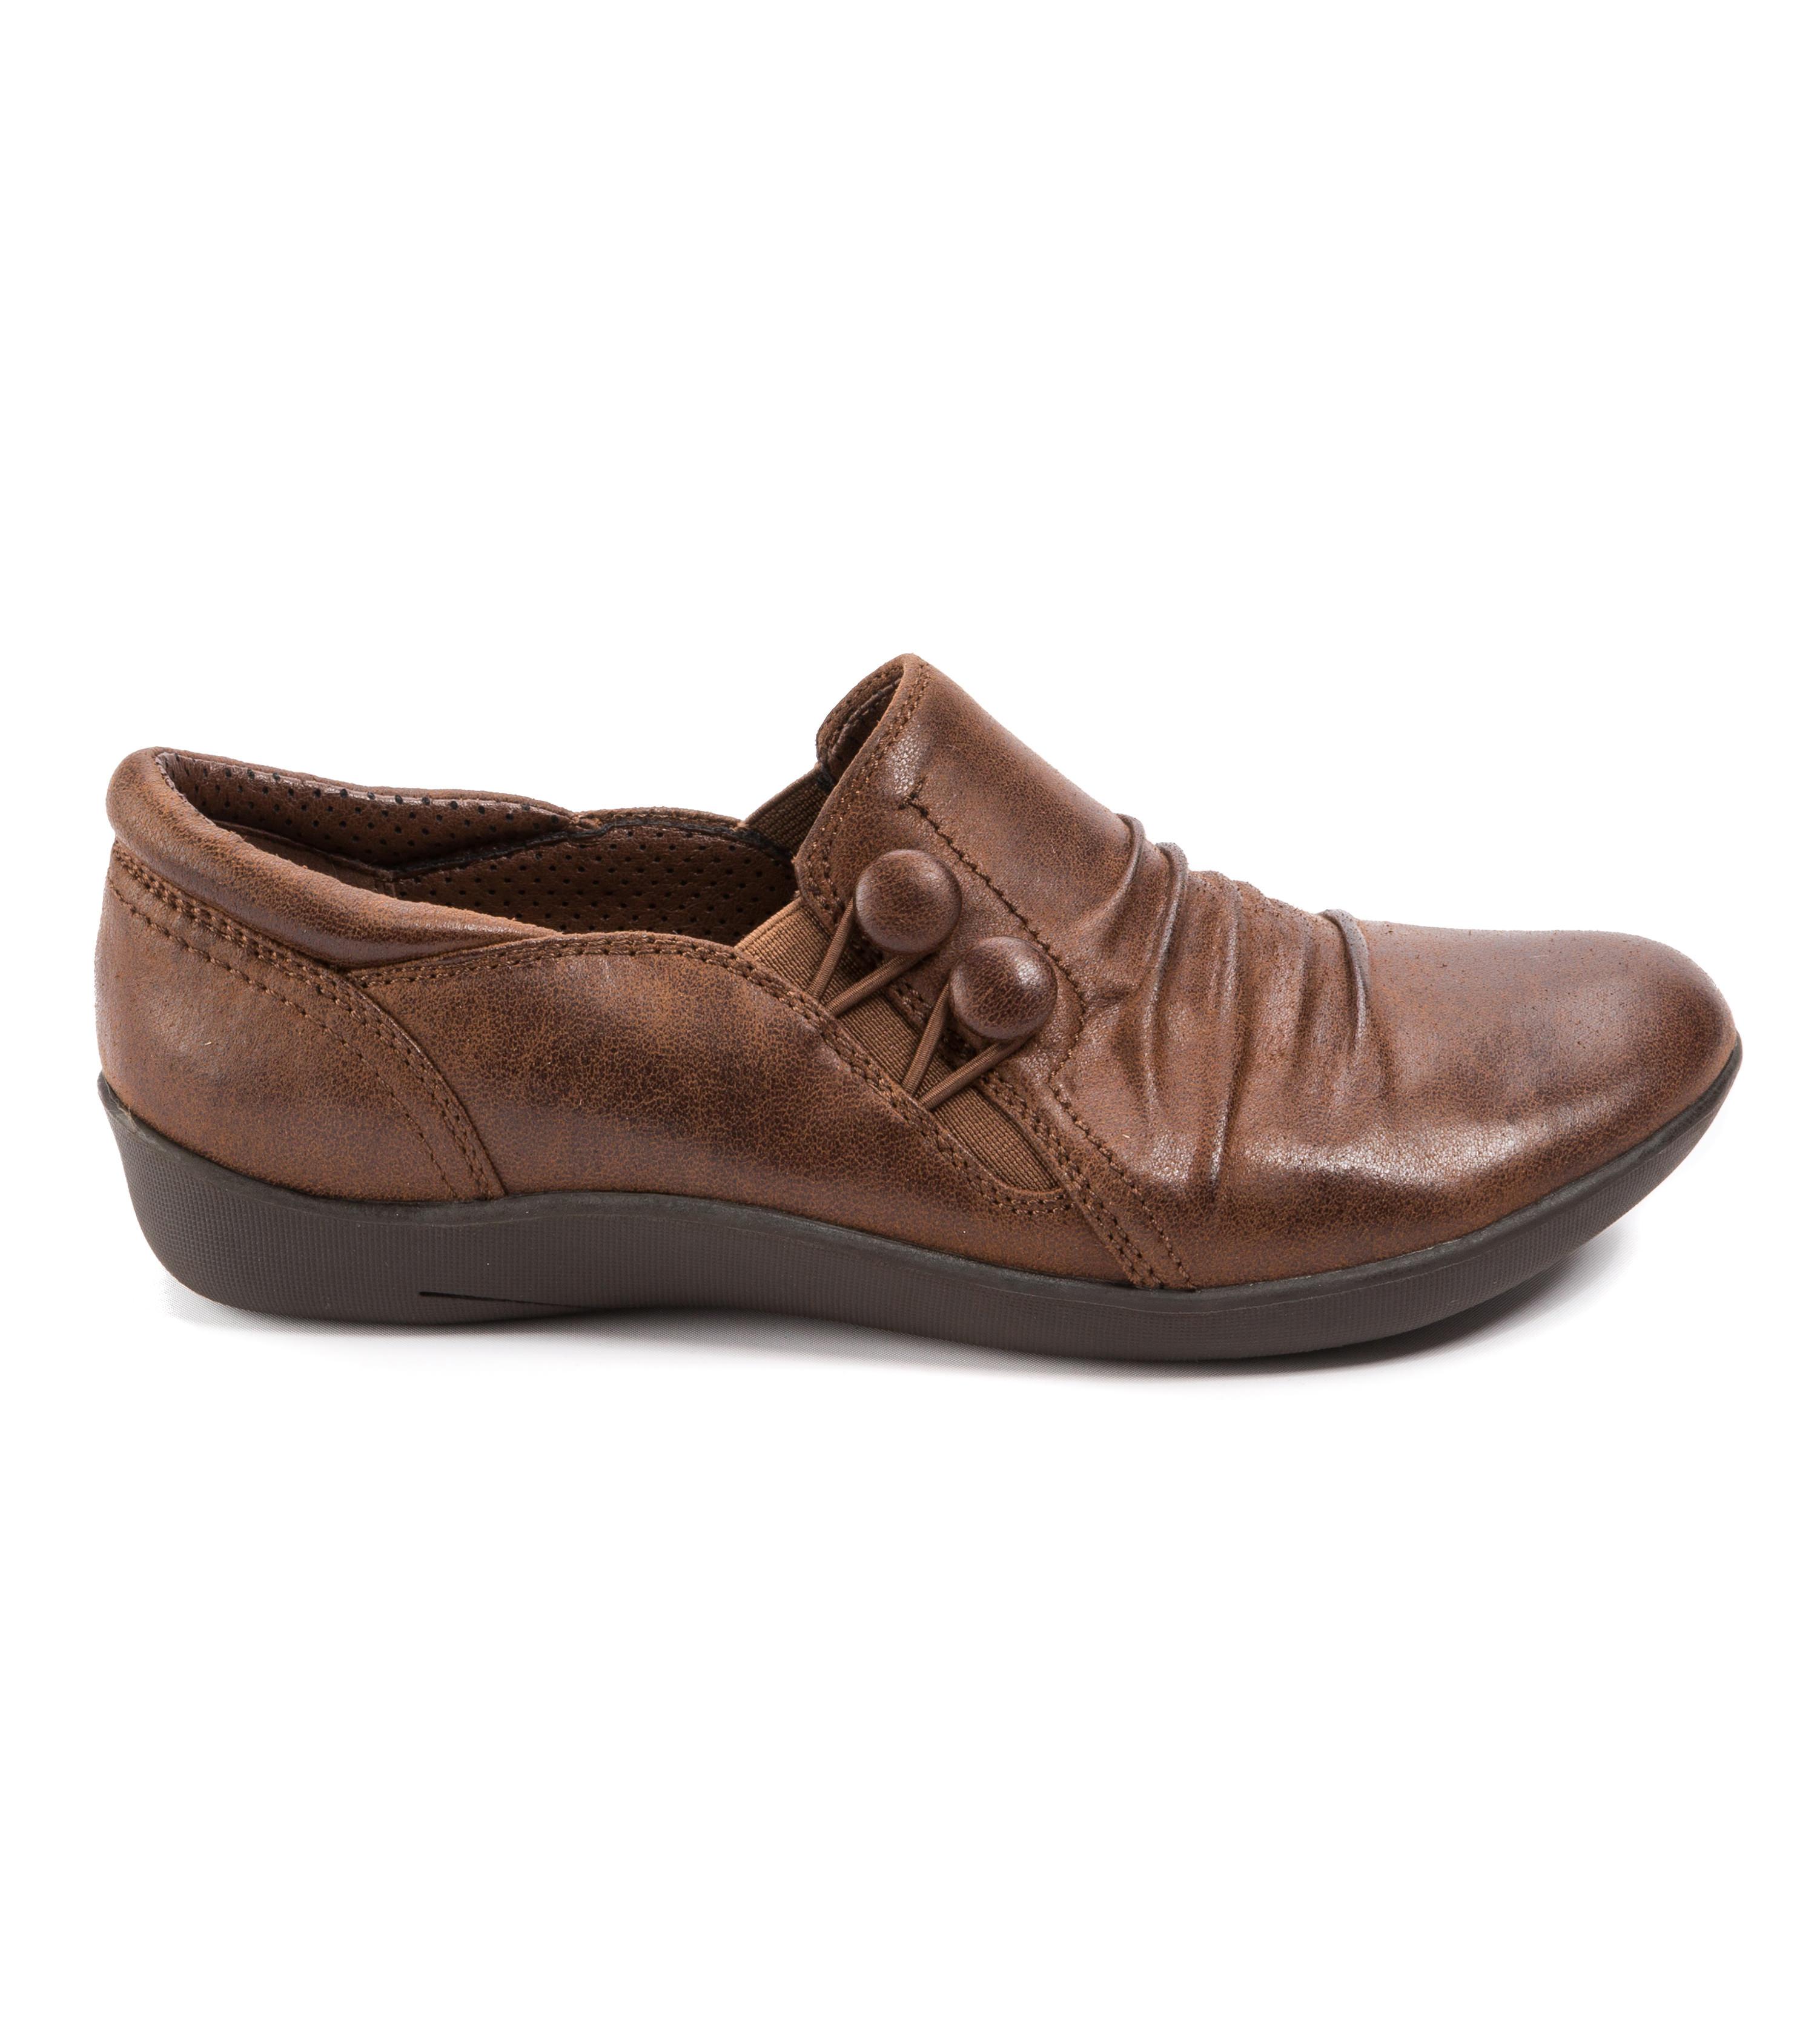 Baretraps Naydia Women's Shoe (Brown Leather)